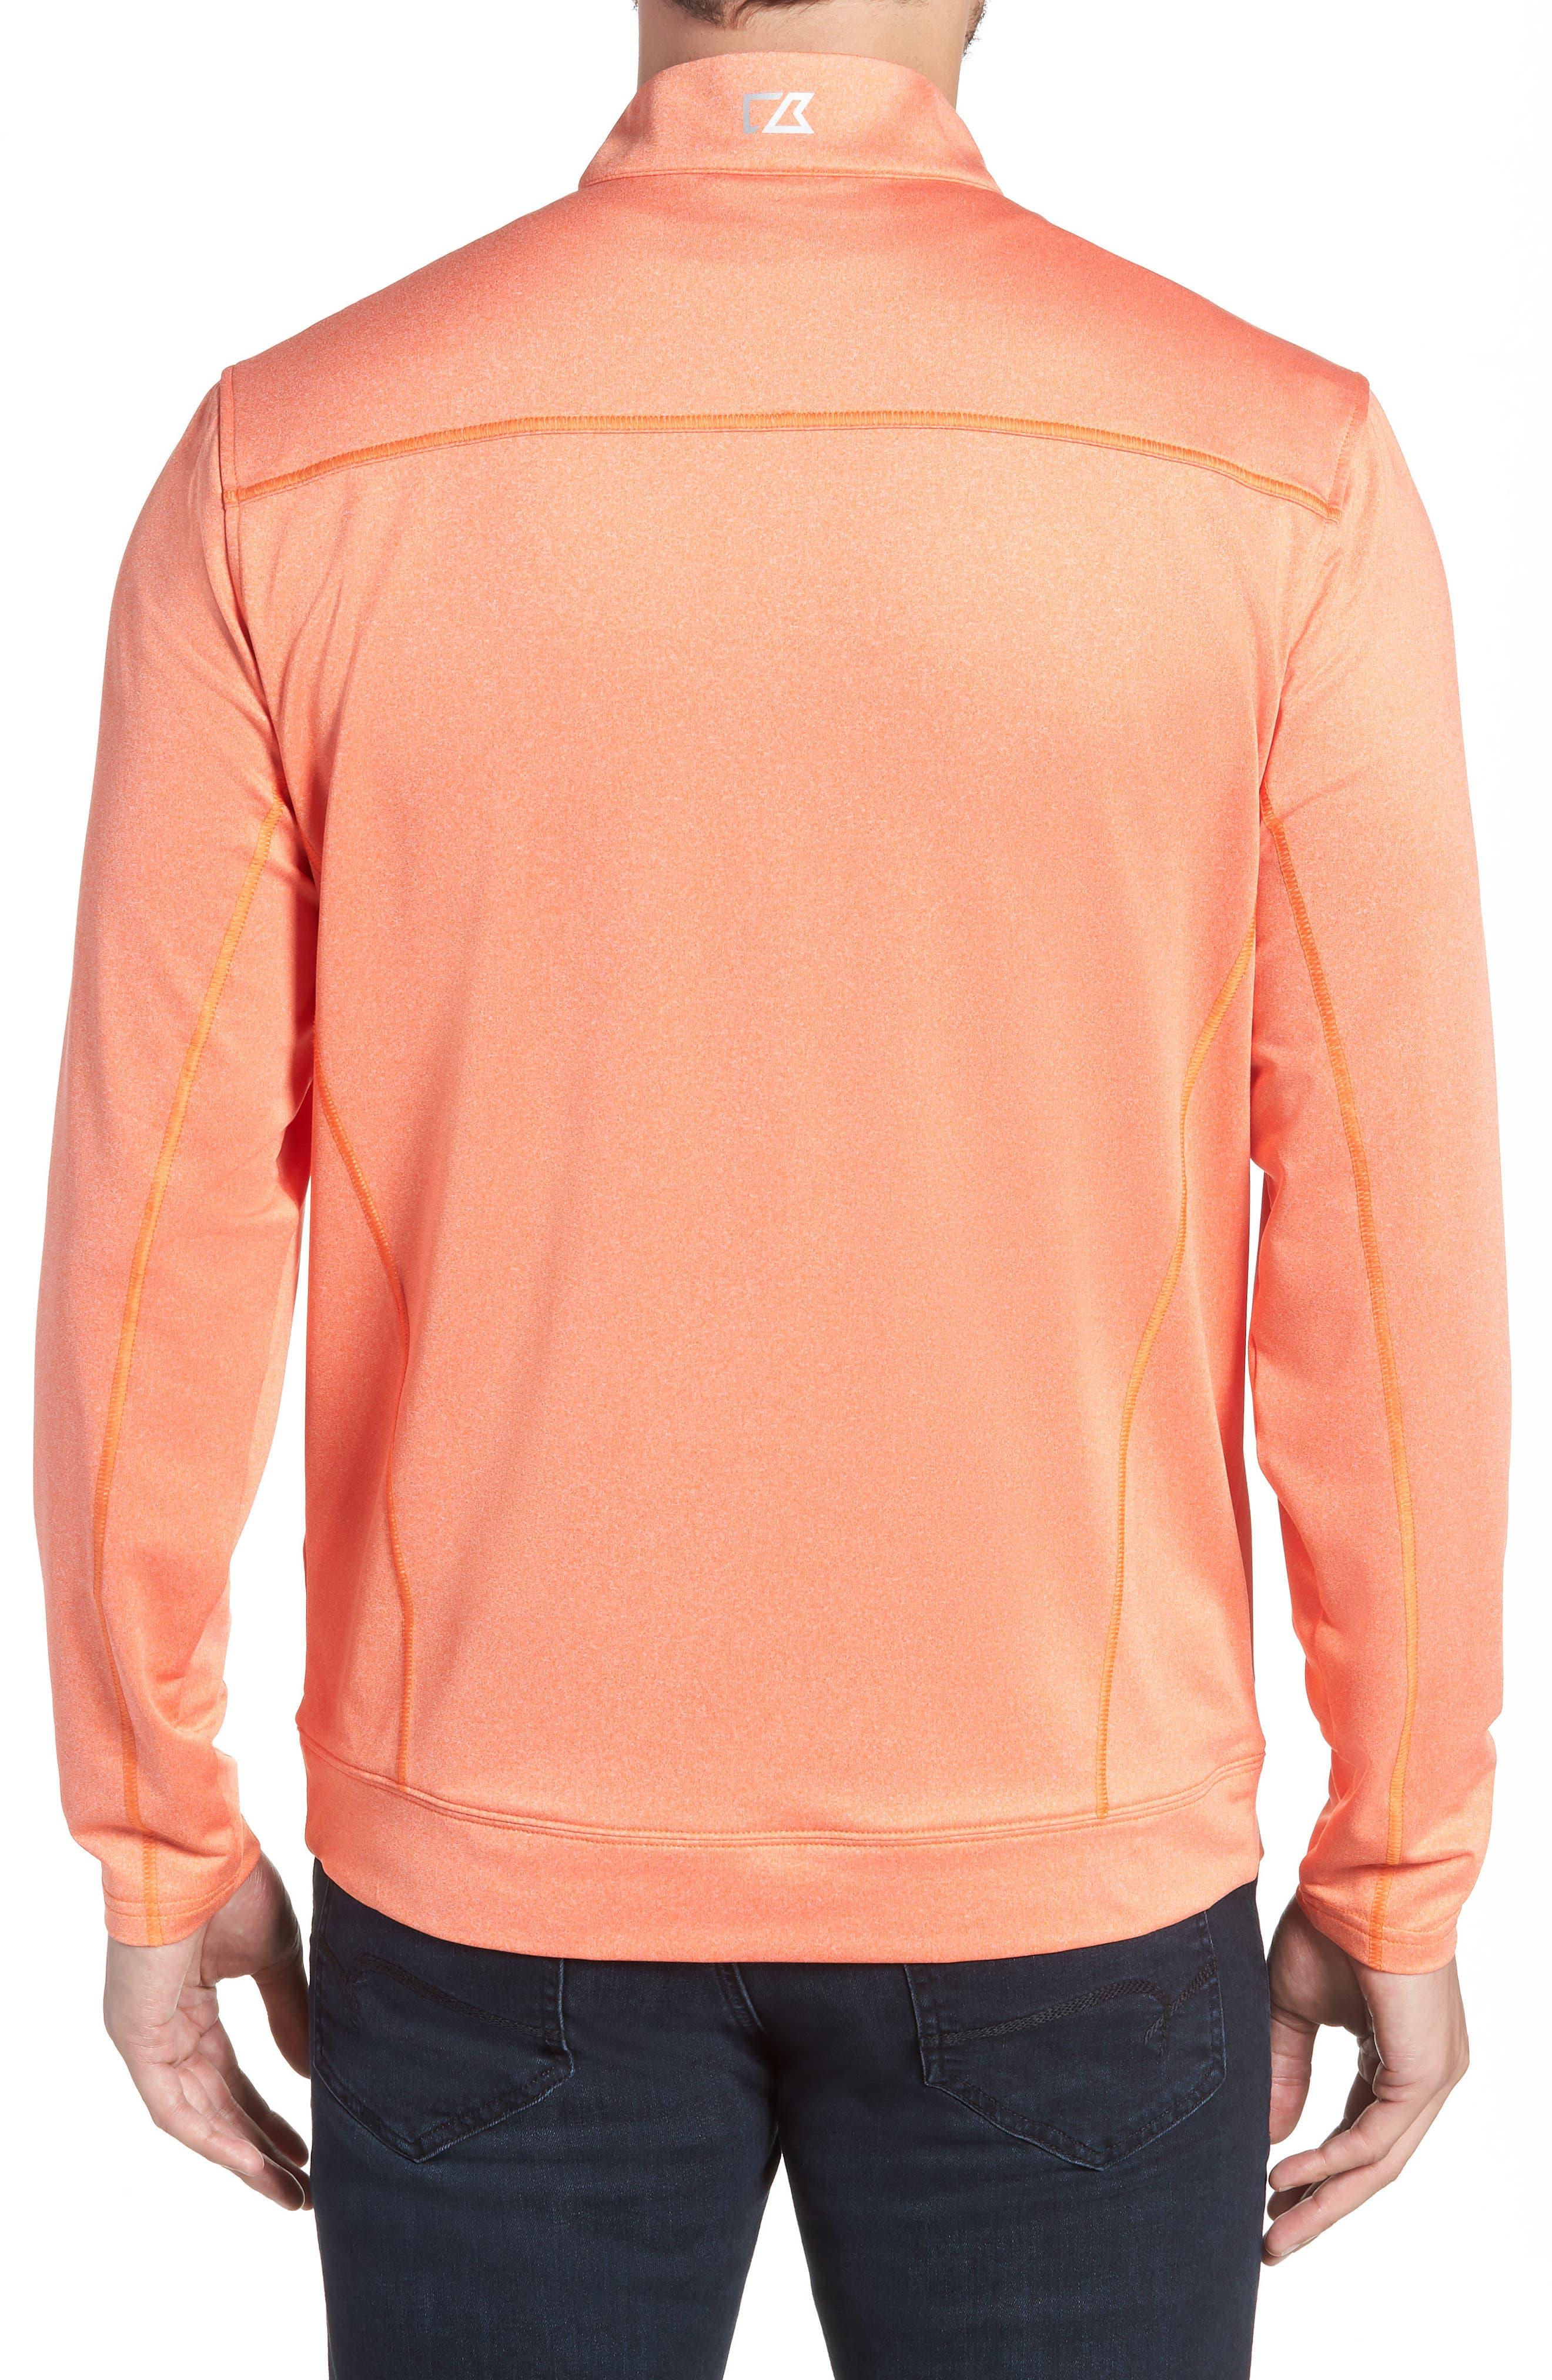 Endurance Cincinnati Bengals Regular Fit Pullover,                             Alternate thumbnail 2, color,                             COLLEGE ORANGE HEATHER